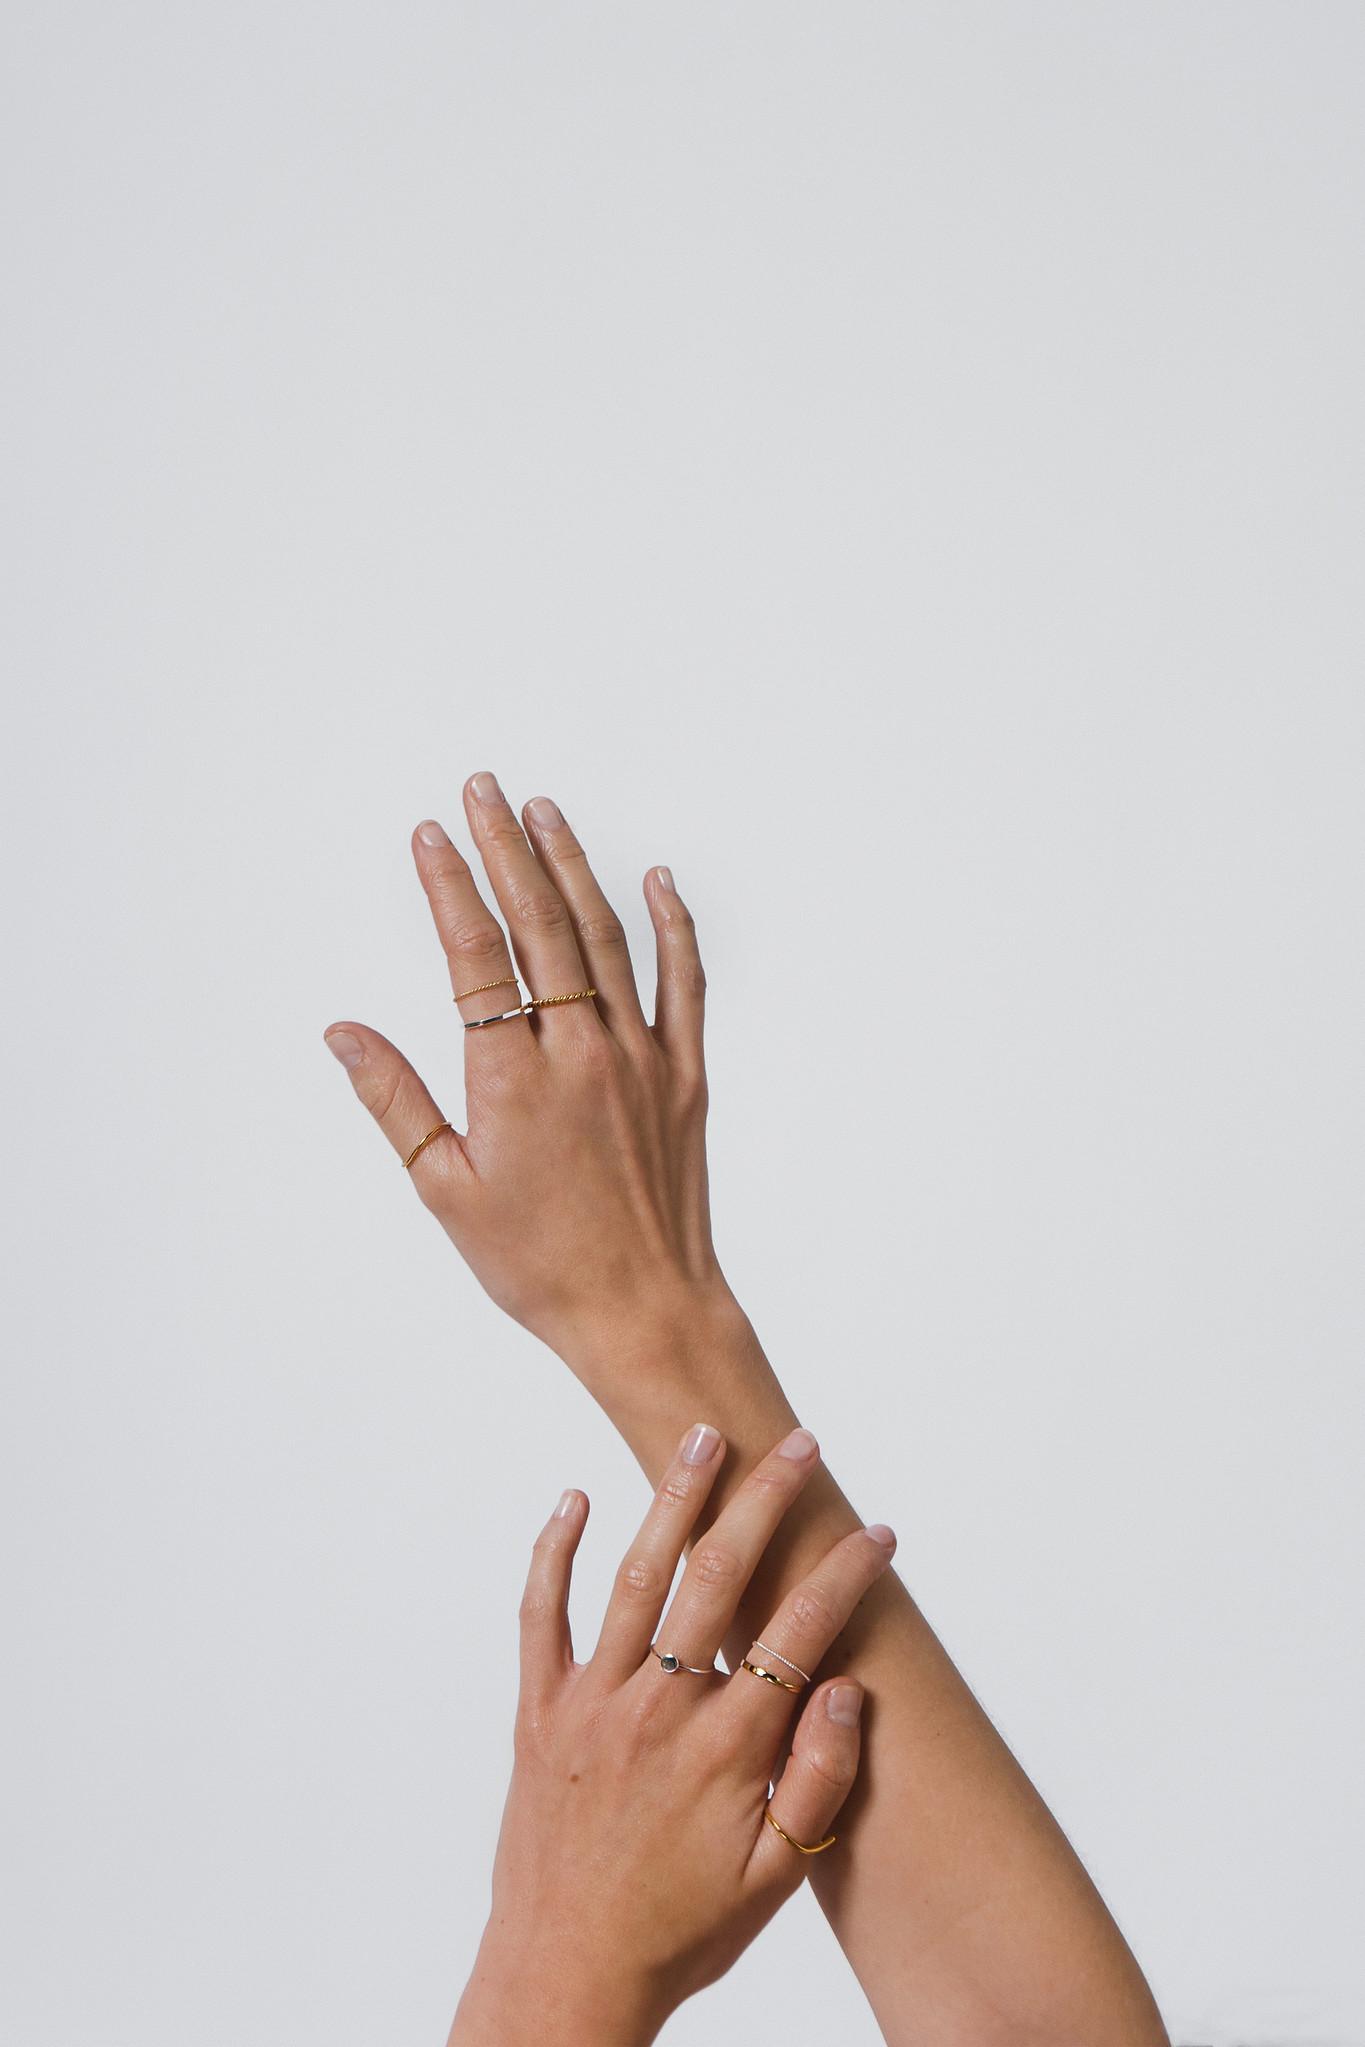 Feiner Ring mit Dreieck - 925er Sterling Silber - gold doubliert-4